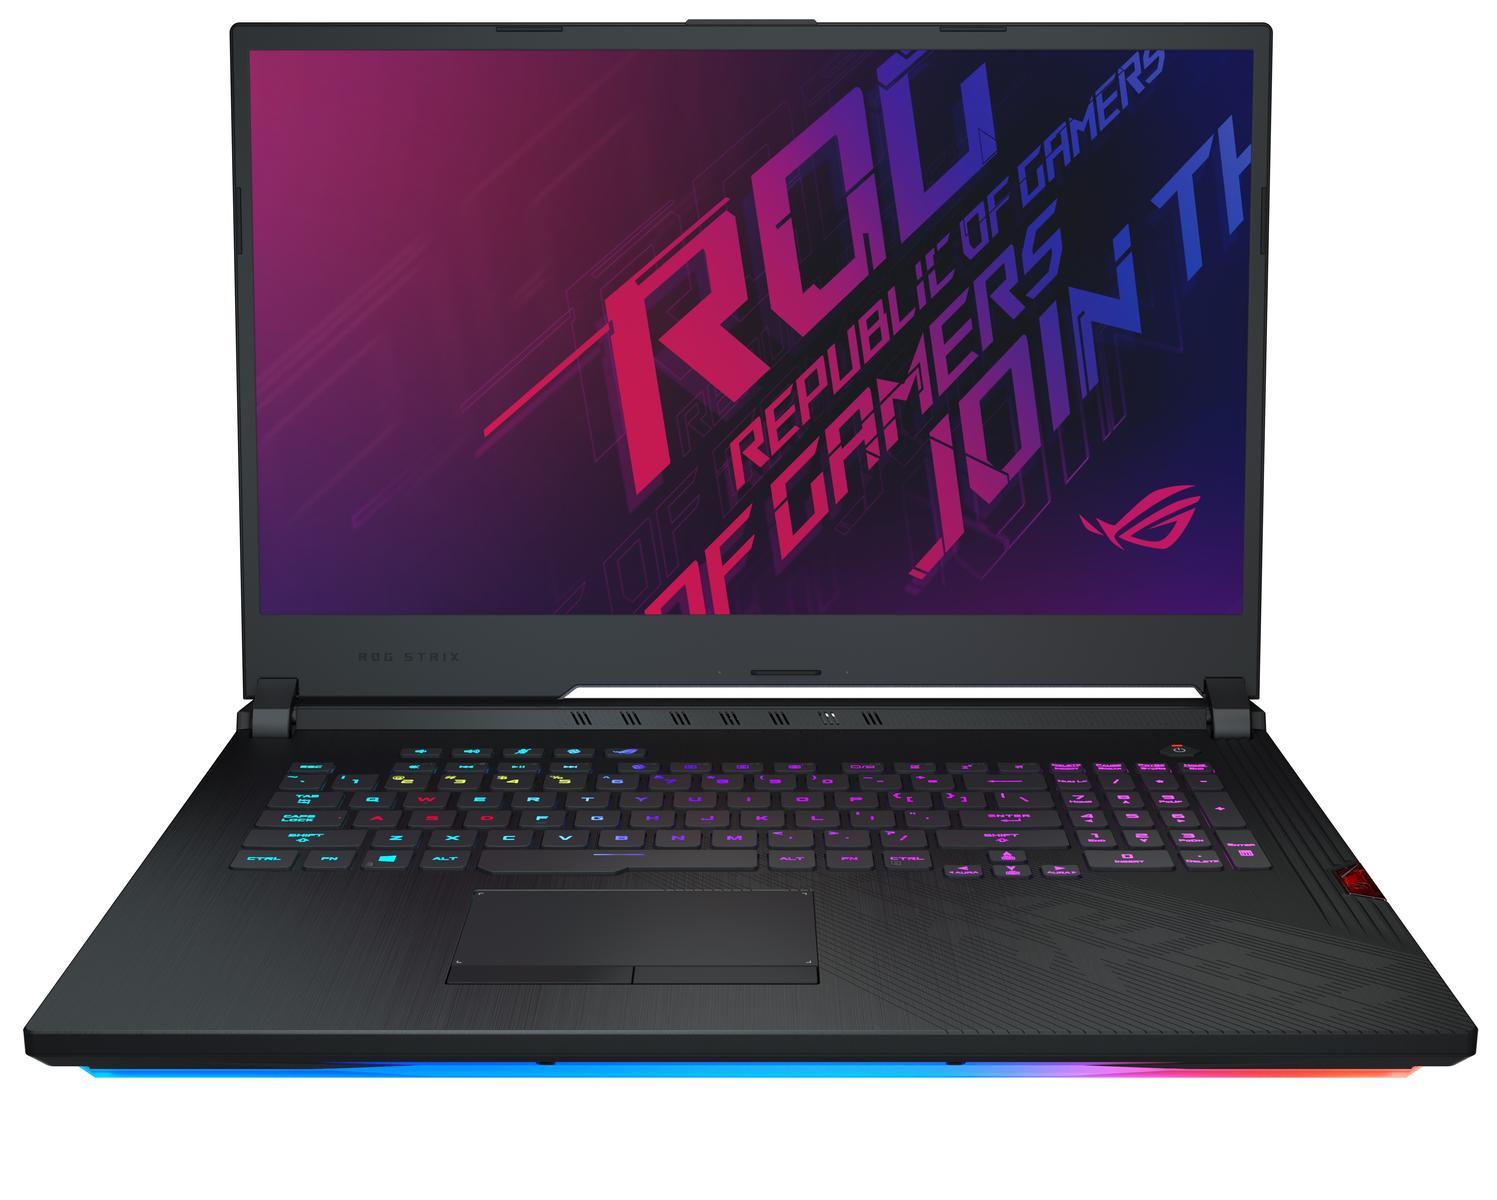 "Asus ROG Strix Hero III (2019) 17.3"" 1920 x 1080 144 Hz Core i7-9750H 2.6 GHz 16 GB Memory 512 GB NVME SSD Storage Laptop"